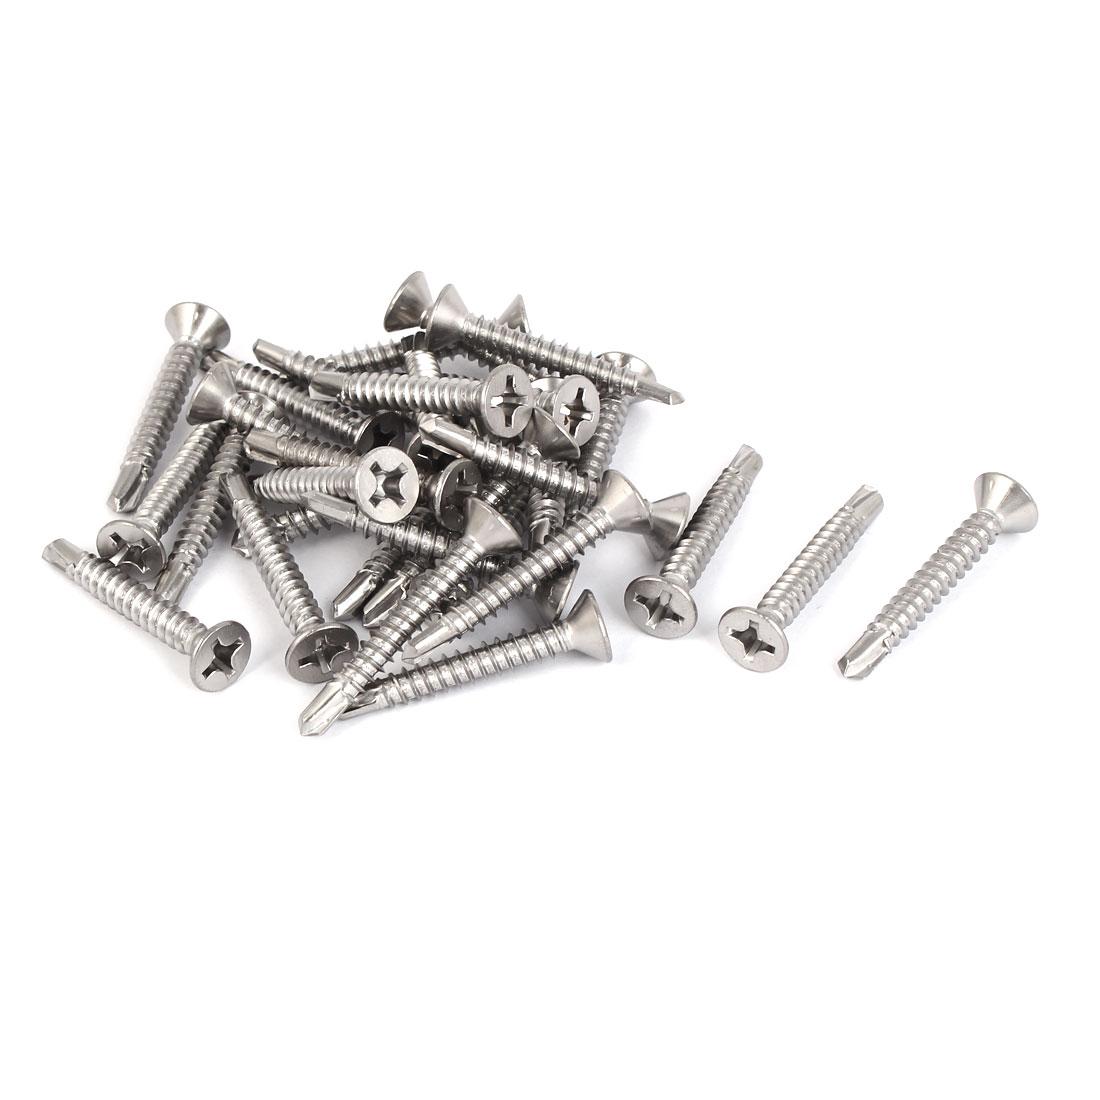 M5.5 #12 Male Thread Self Drilling Countersunk Head Screws 38mm Long 30 Pcs